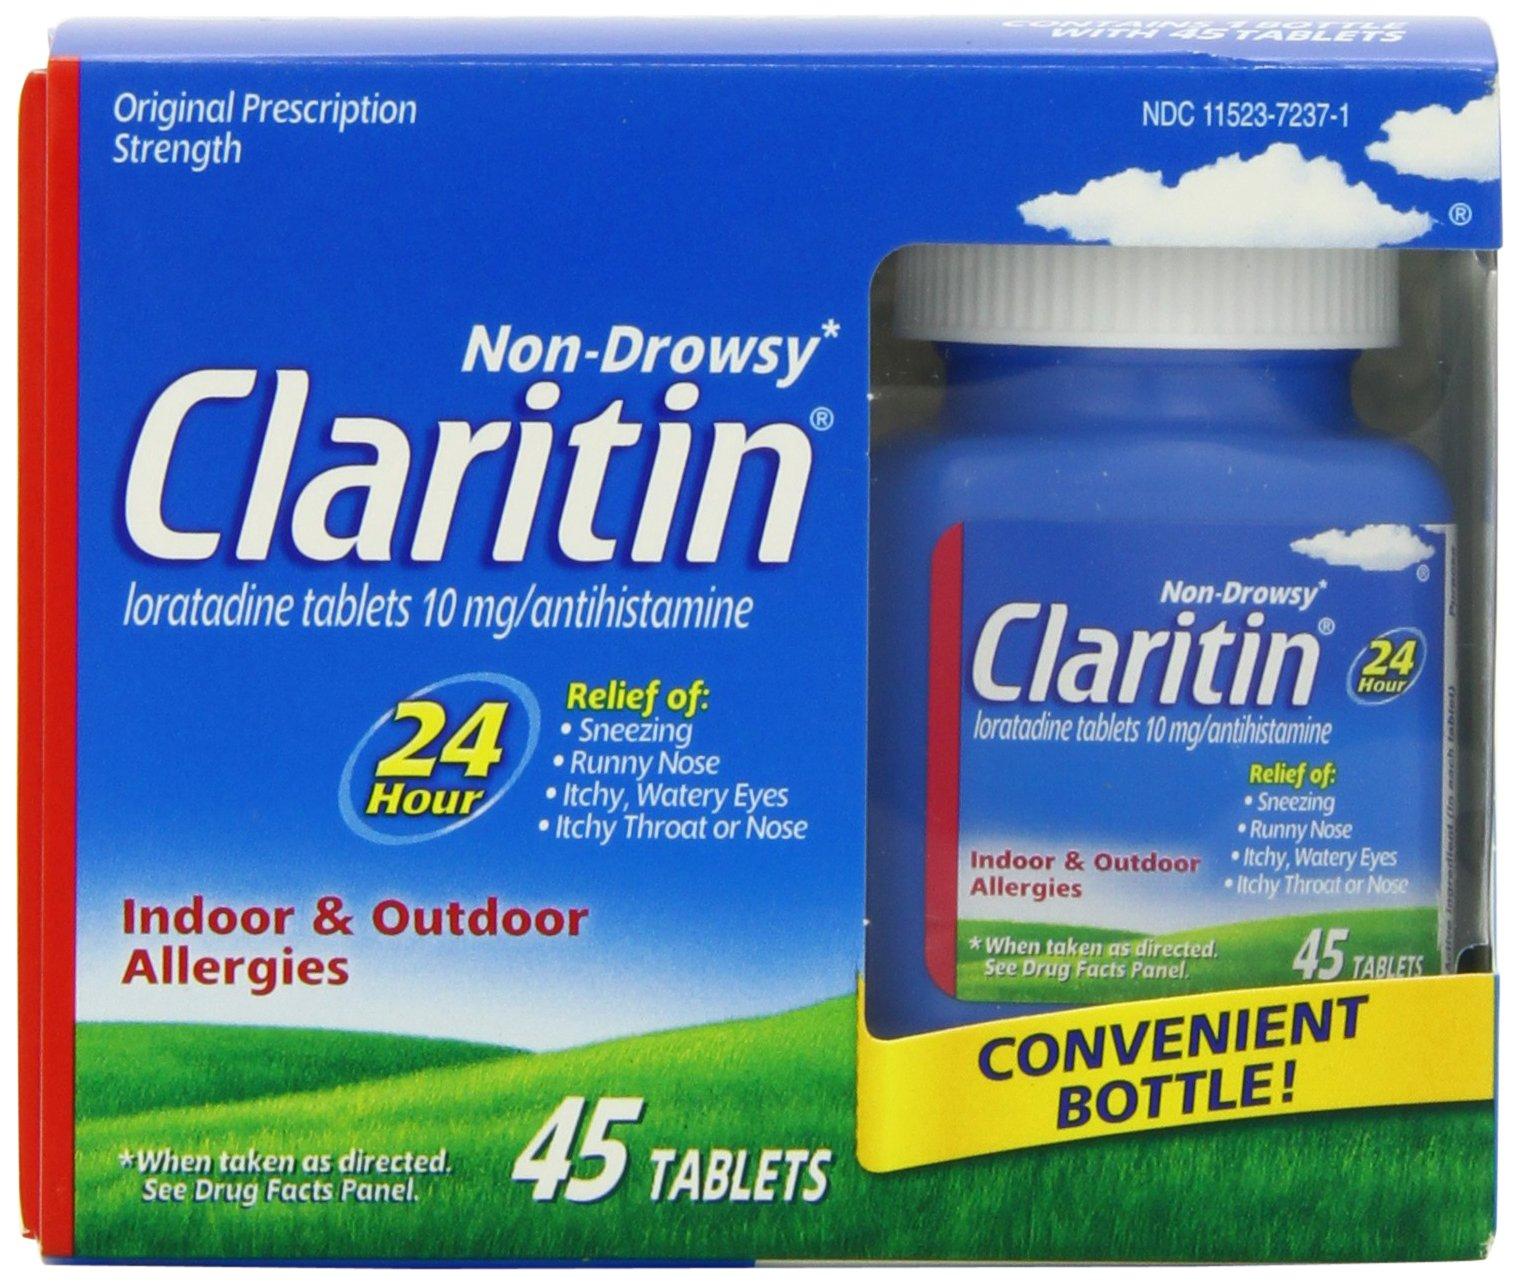 Zyrtec 24 Hour Allergy Relief Tablets, Antihistamine